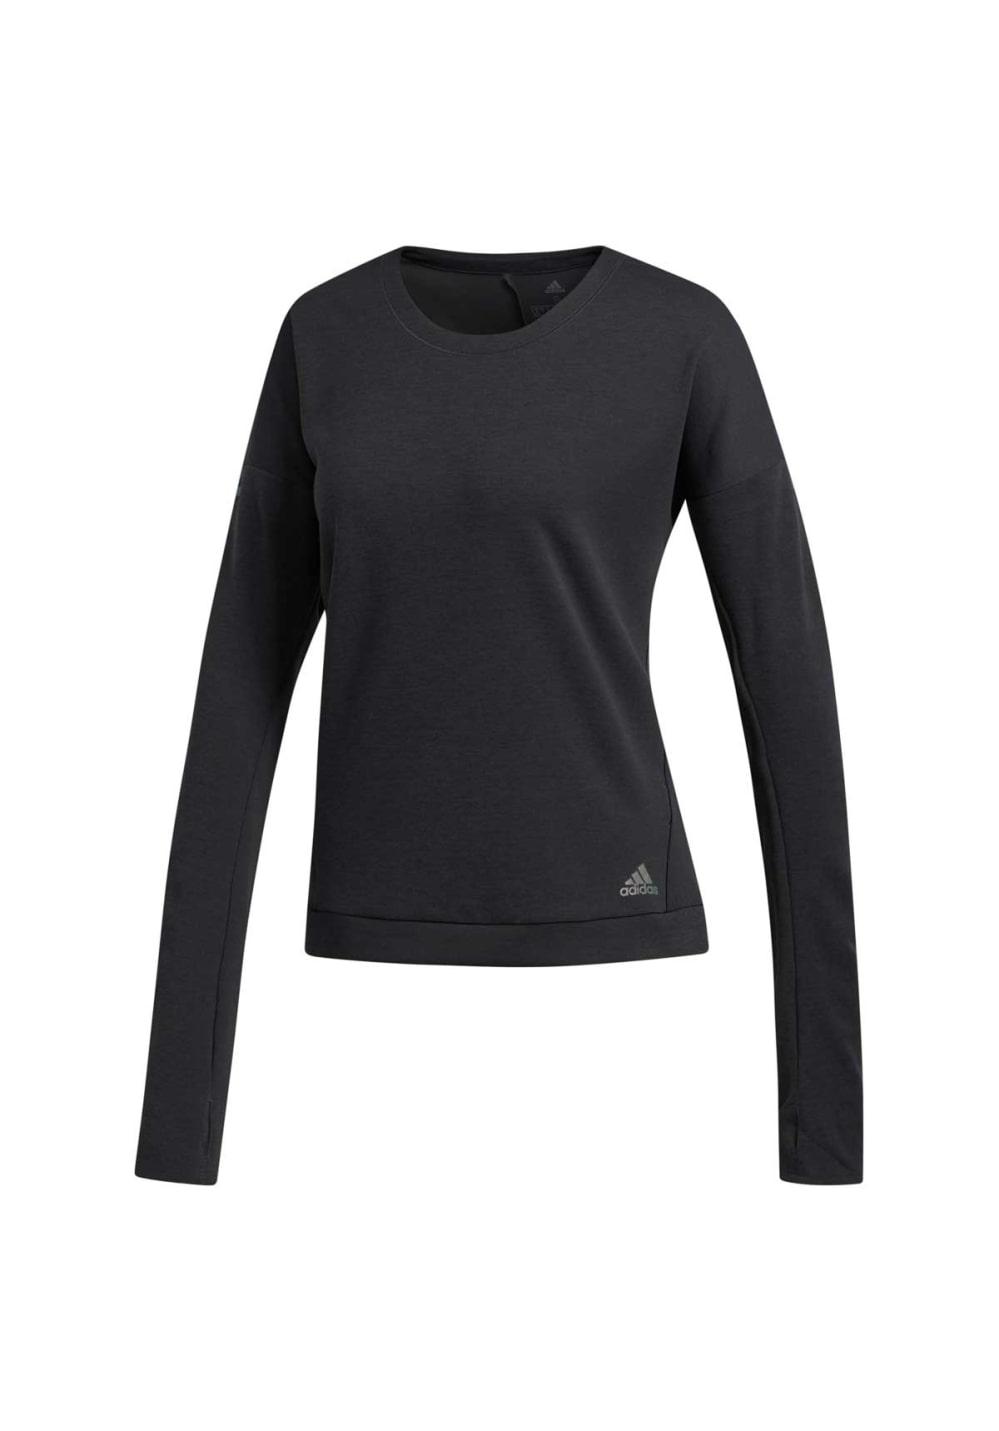 adidas Women's Aktiv Hoodie Long Sleeve Shirt